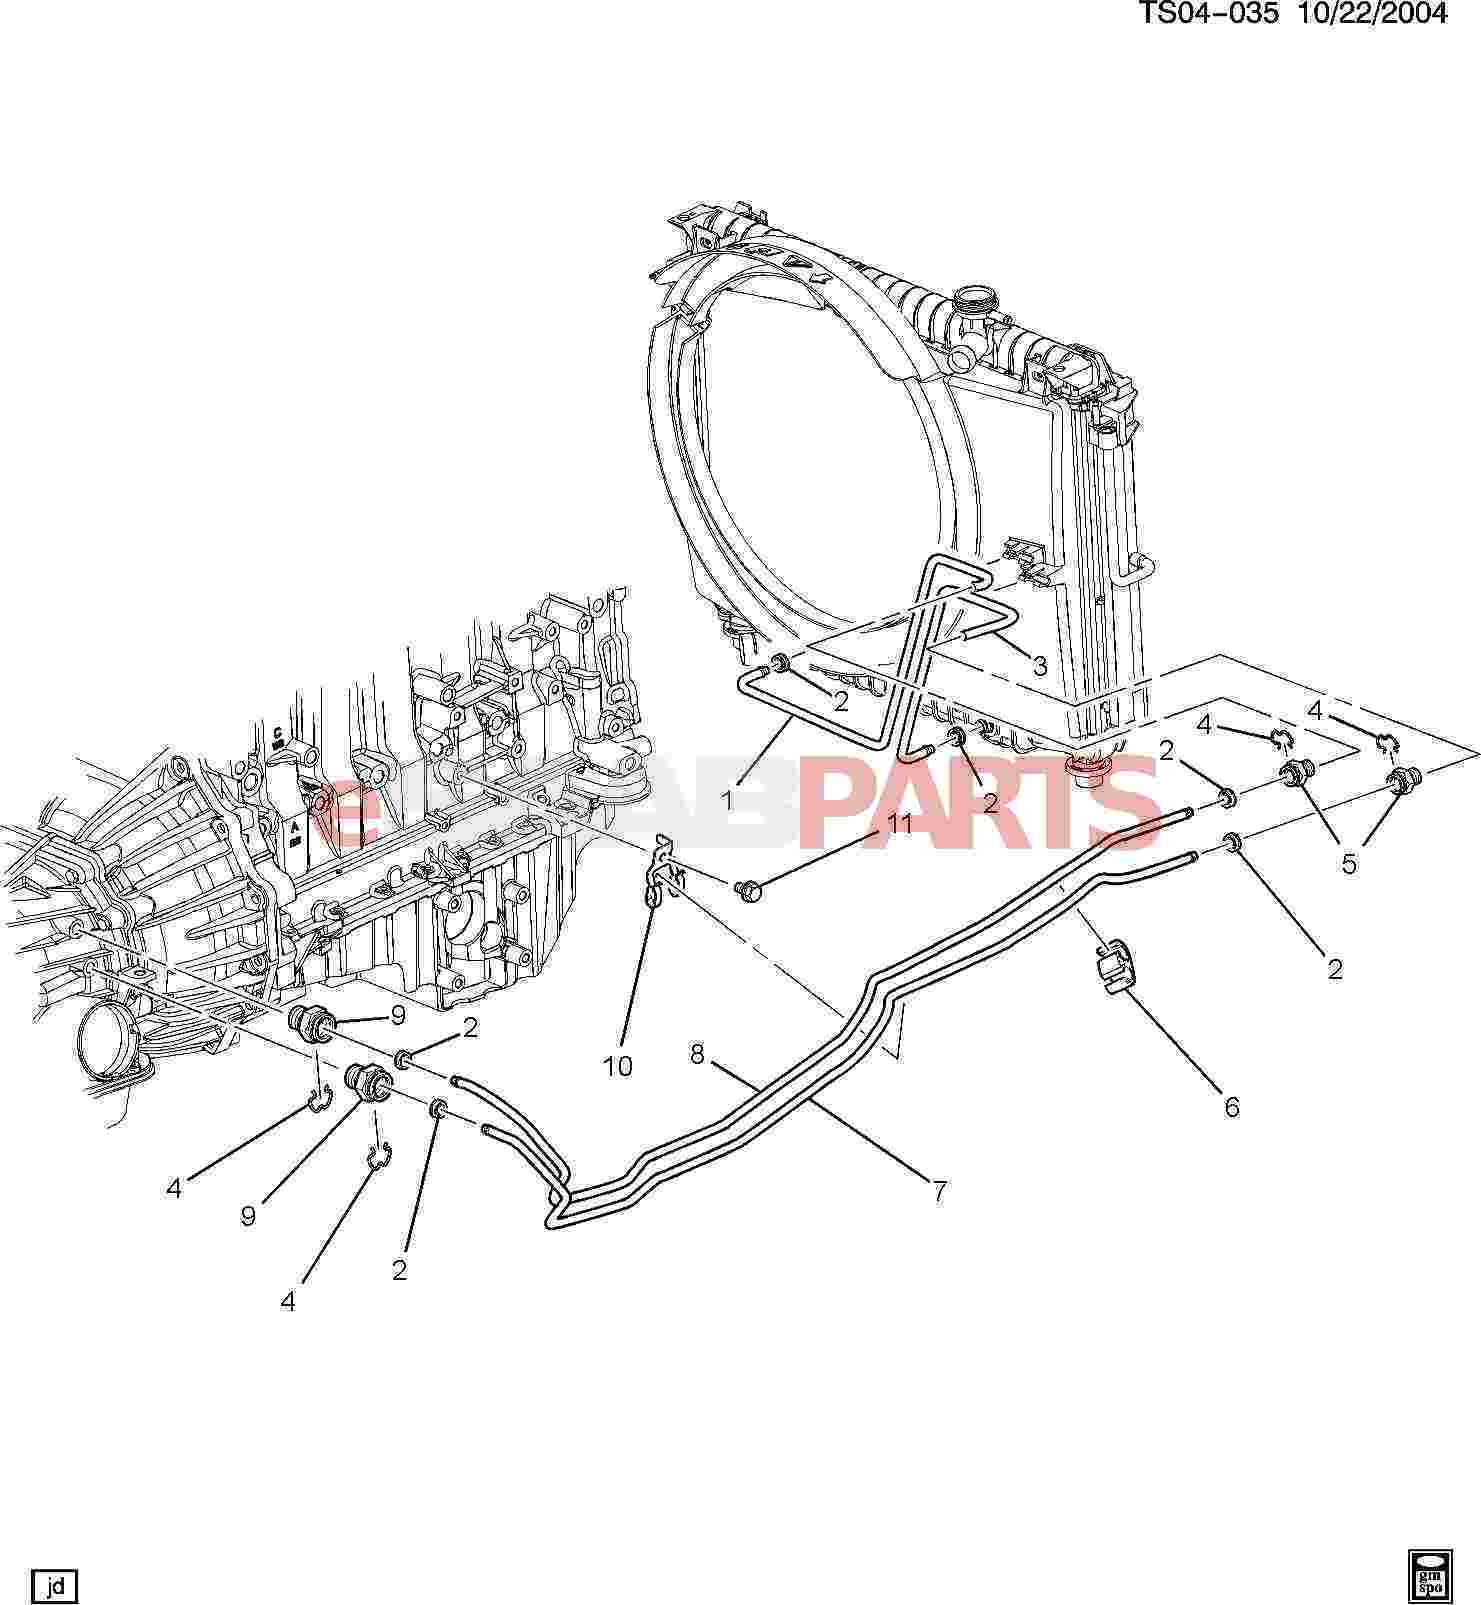 Saab Fitting Trans Fluid Clr Pipe